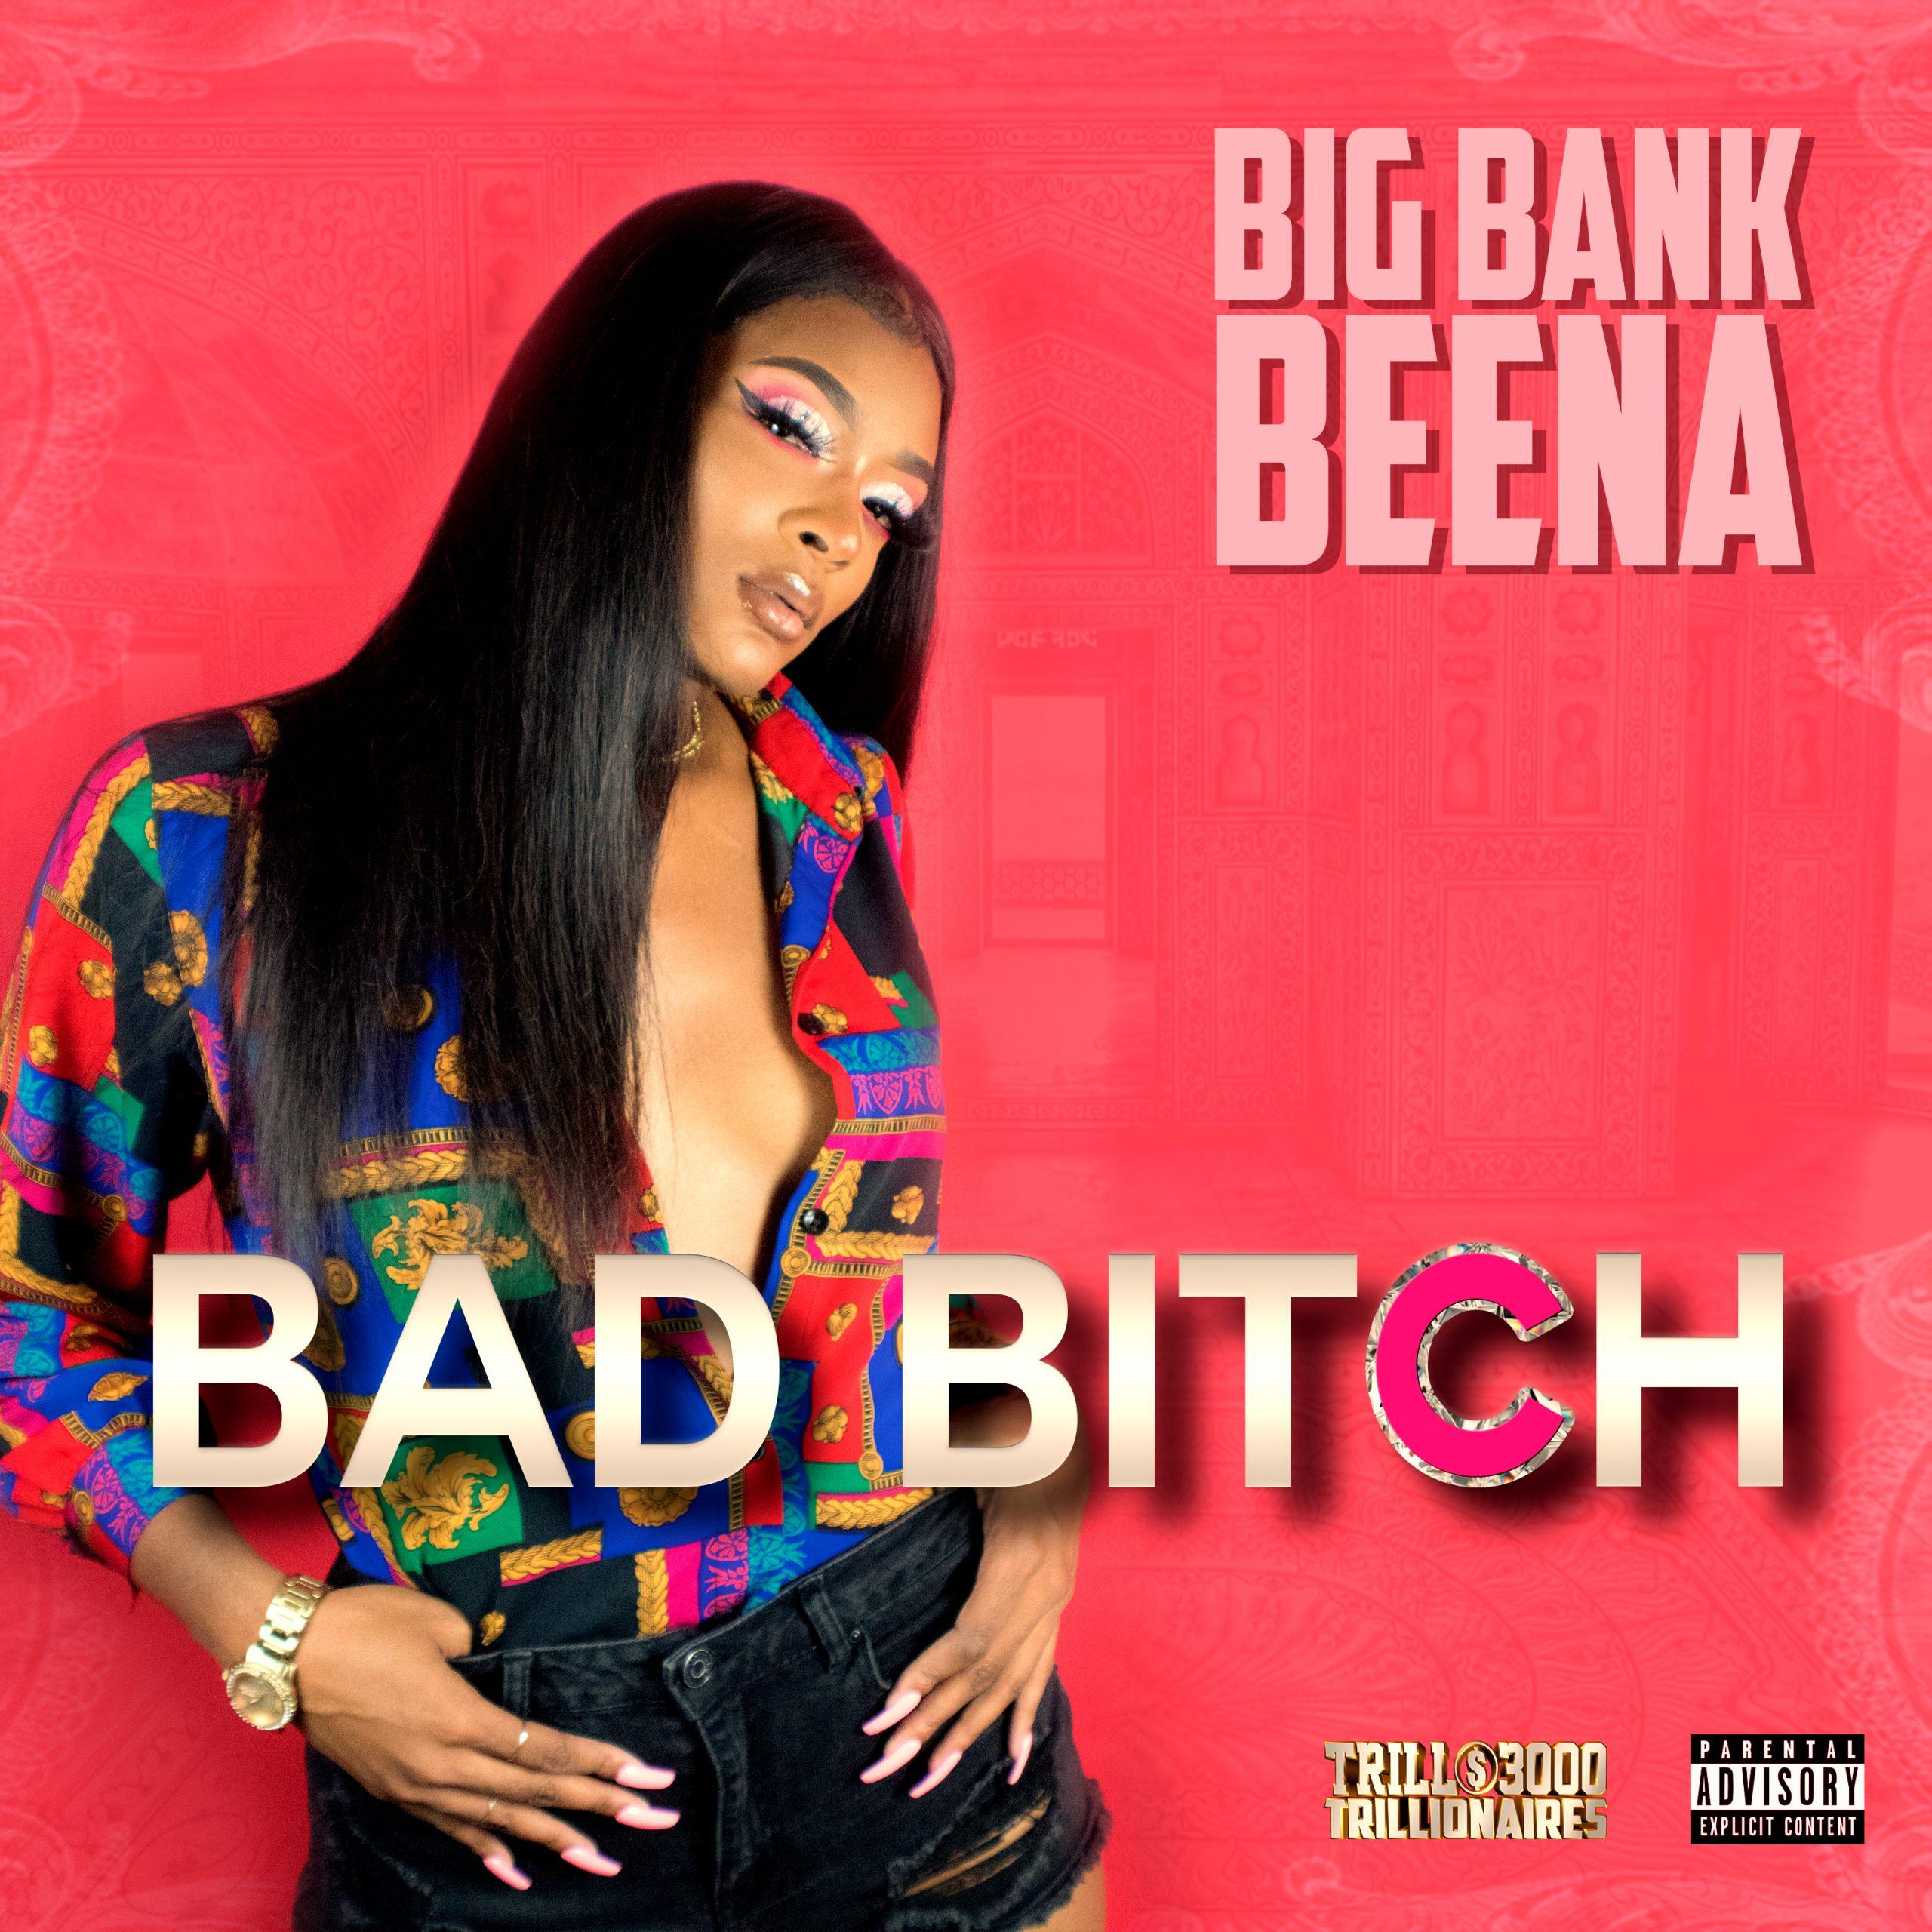 Big Bank Beena Bad Bitch cover art